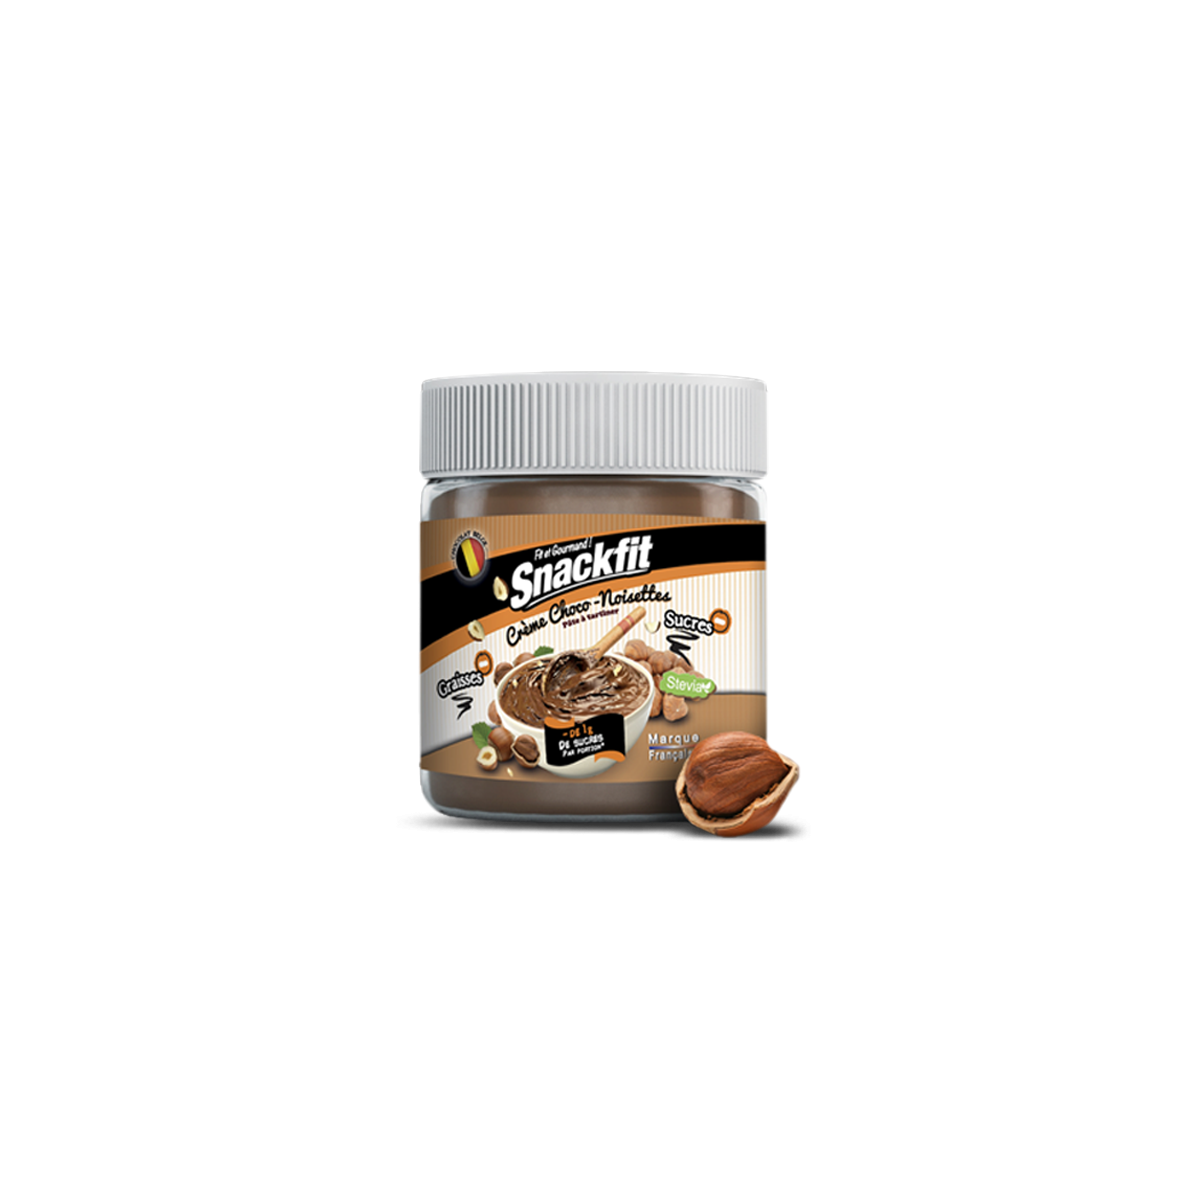 CREME CHOCO-NOISETTE (250g)